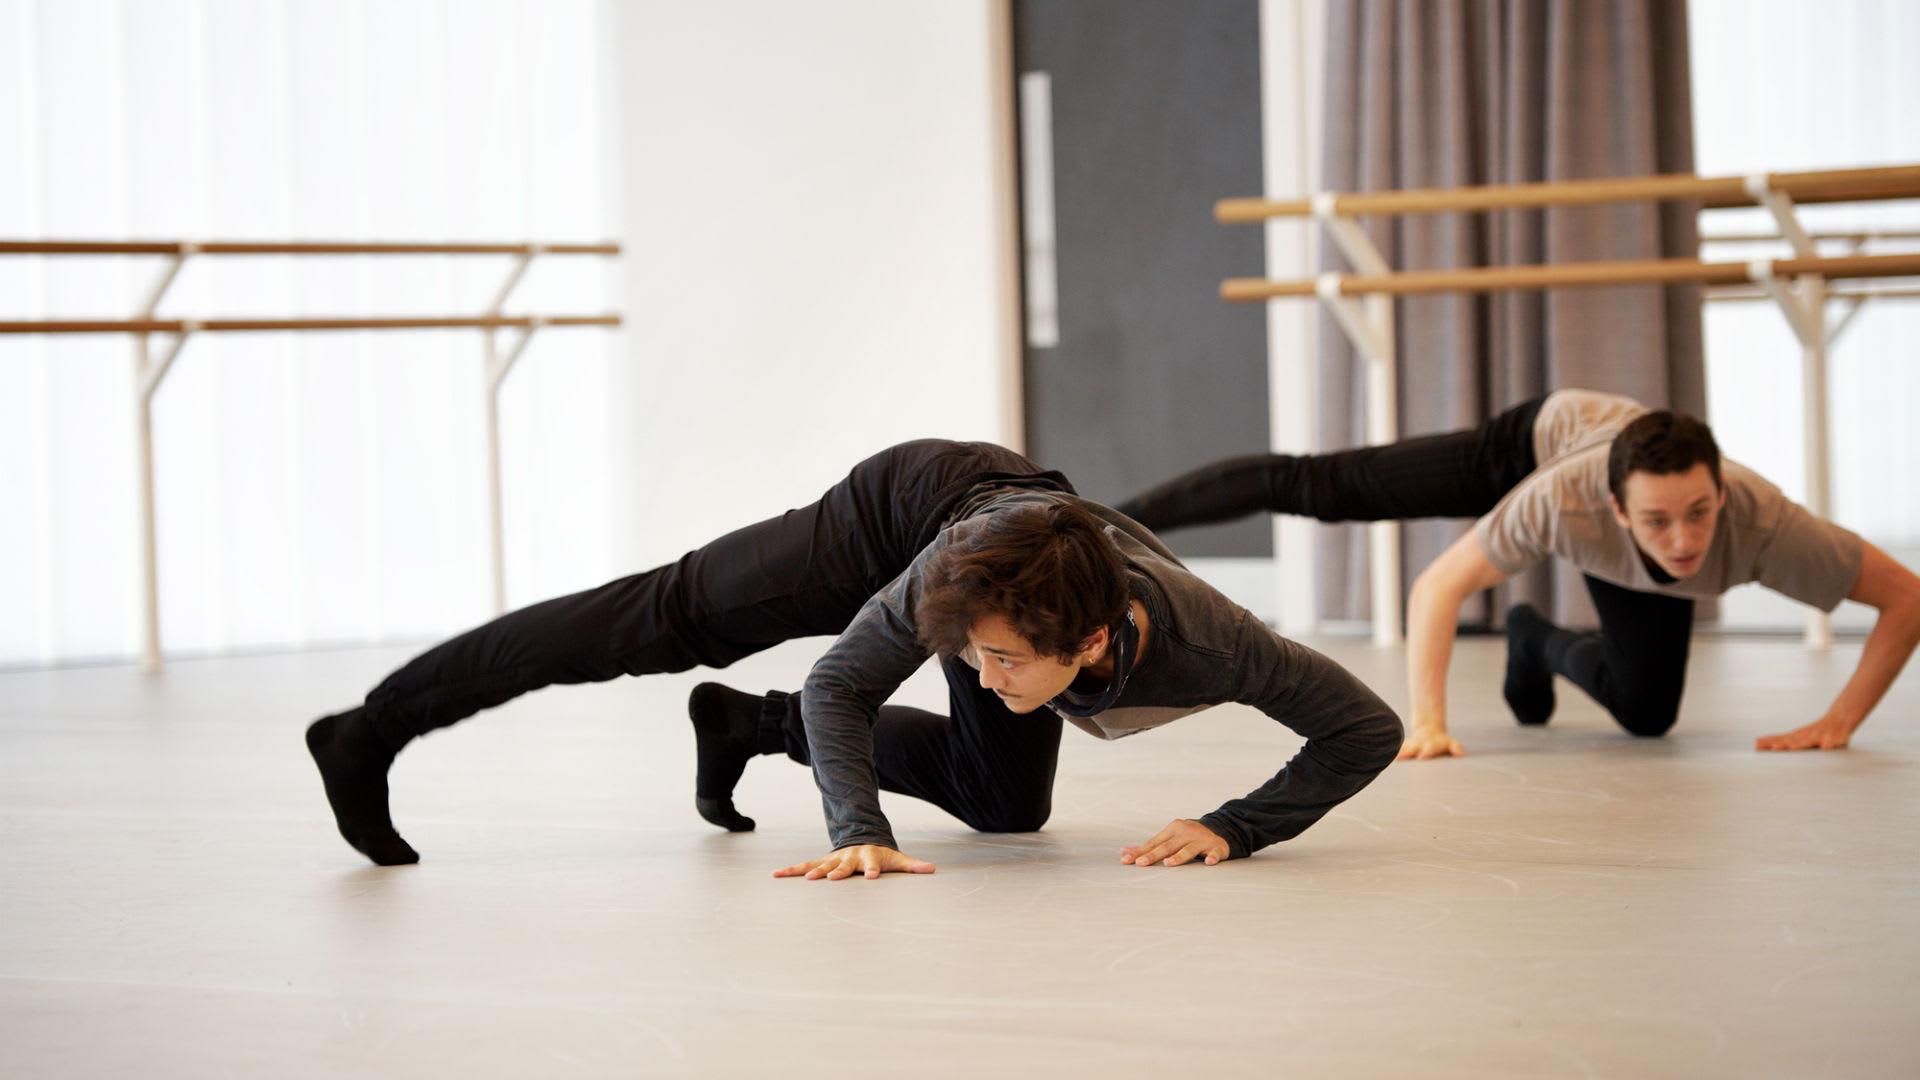 English National Ballet - Akram Khan's Creature Prod Shot